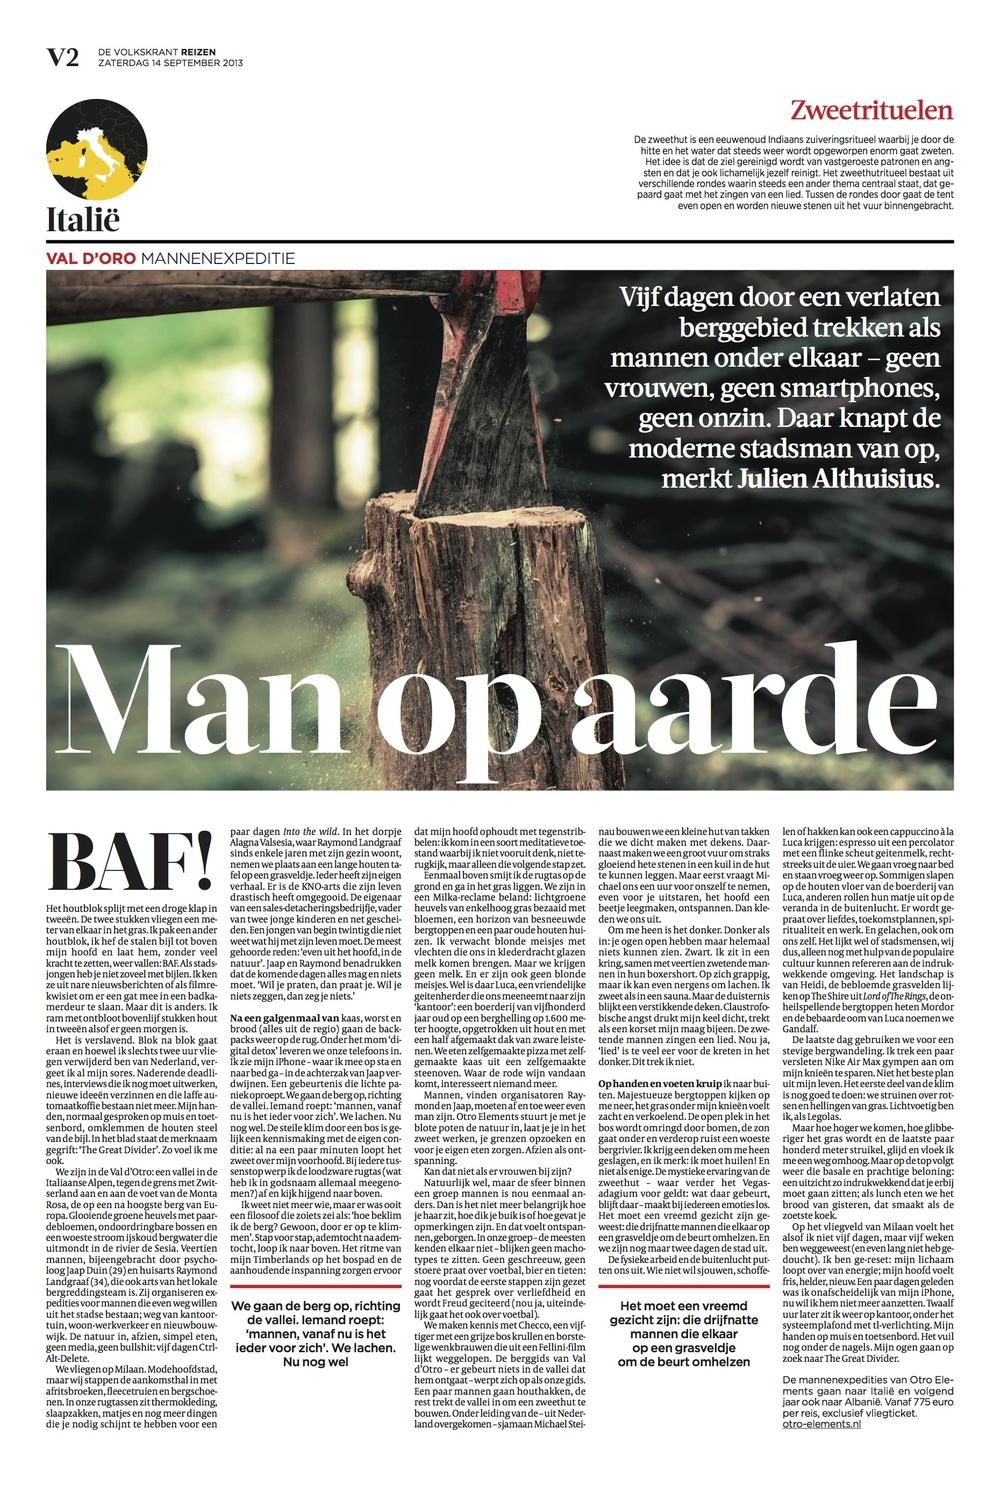 Volkskrant-sept 2013.jpg